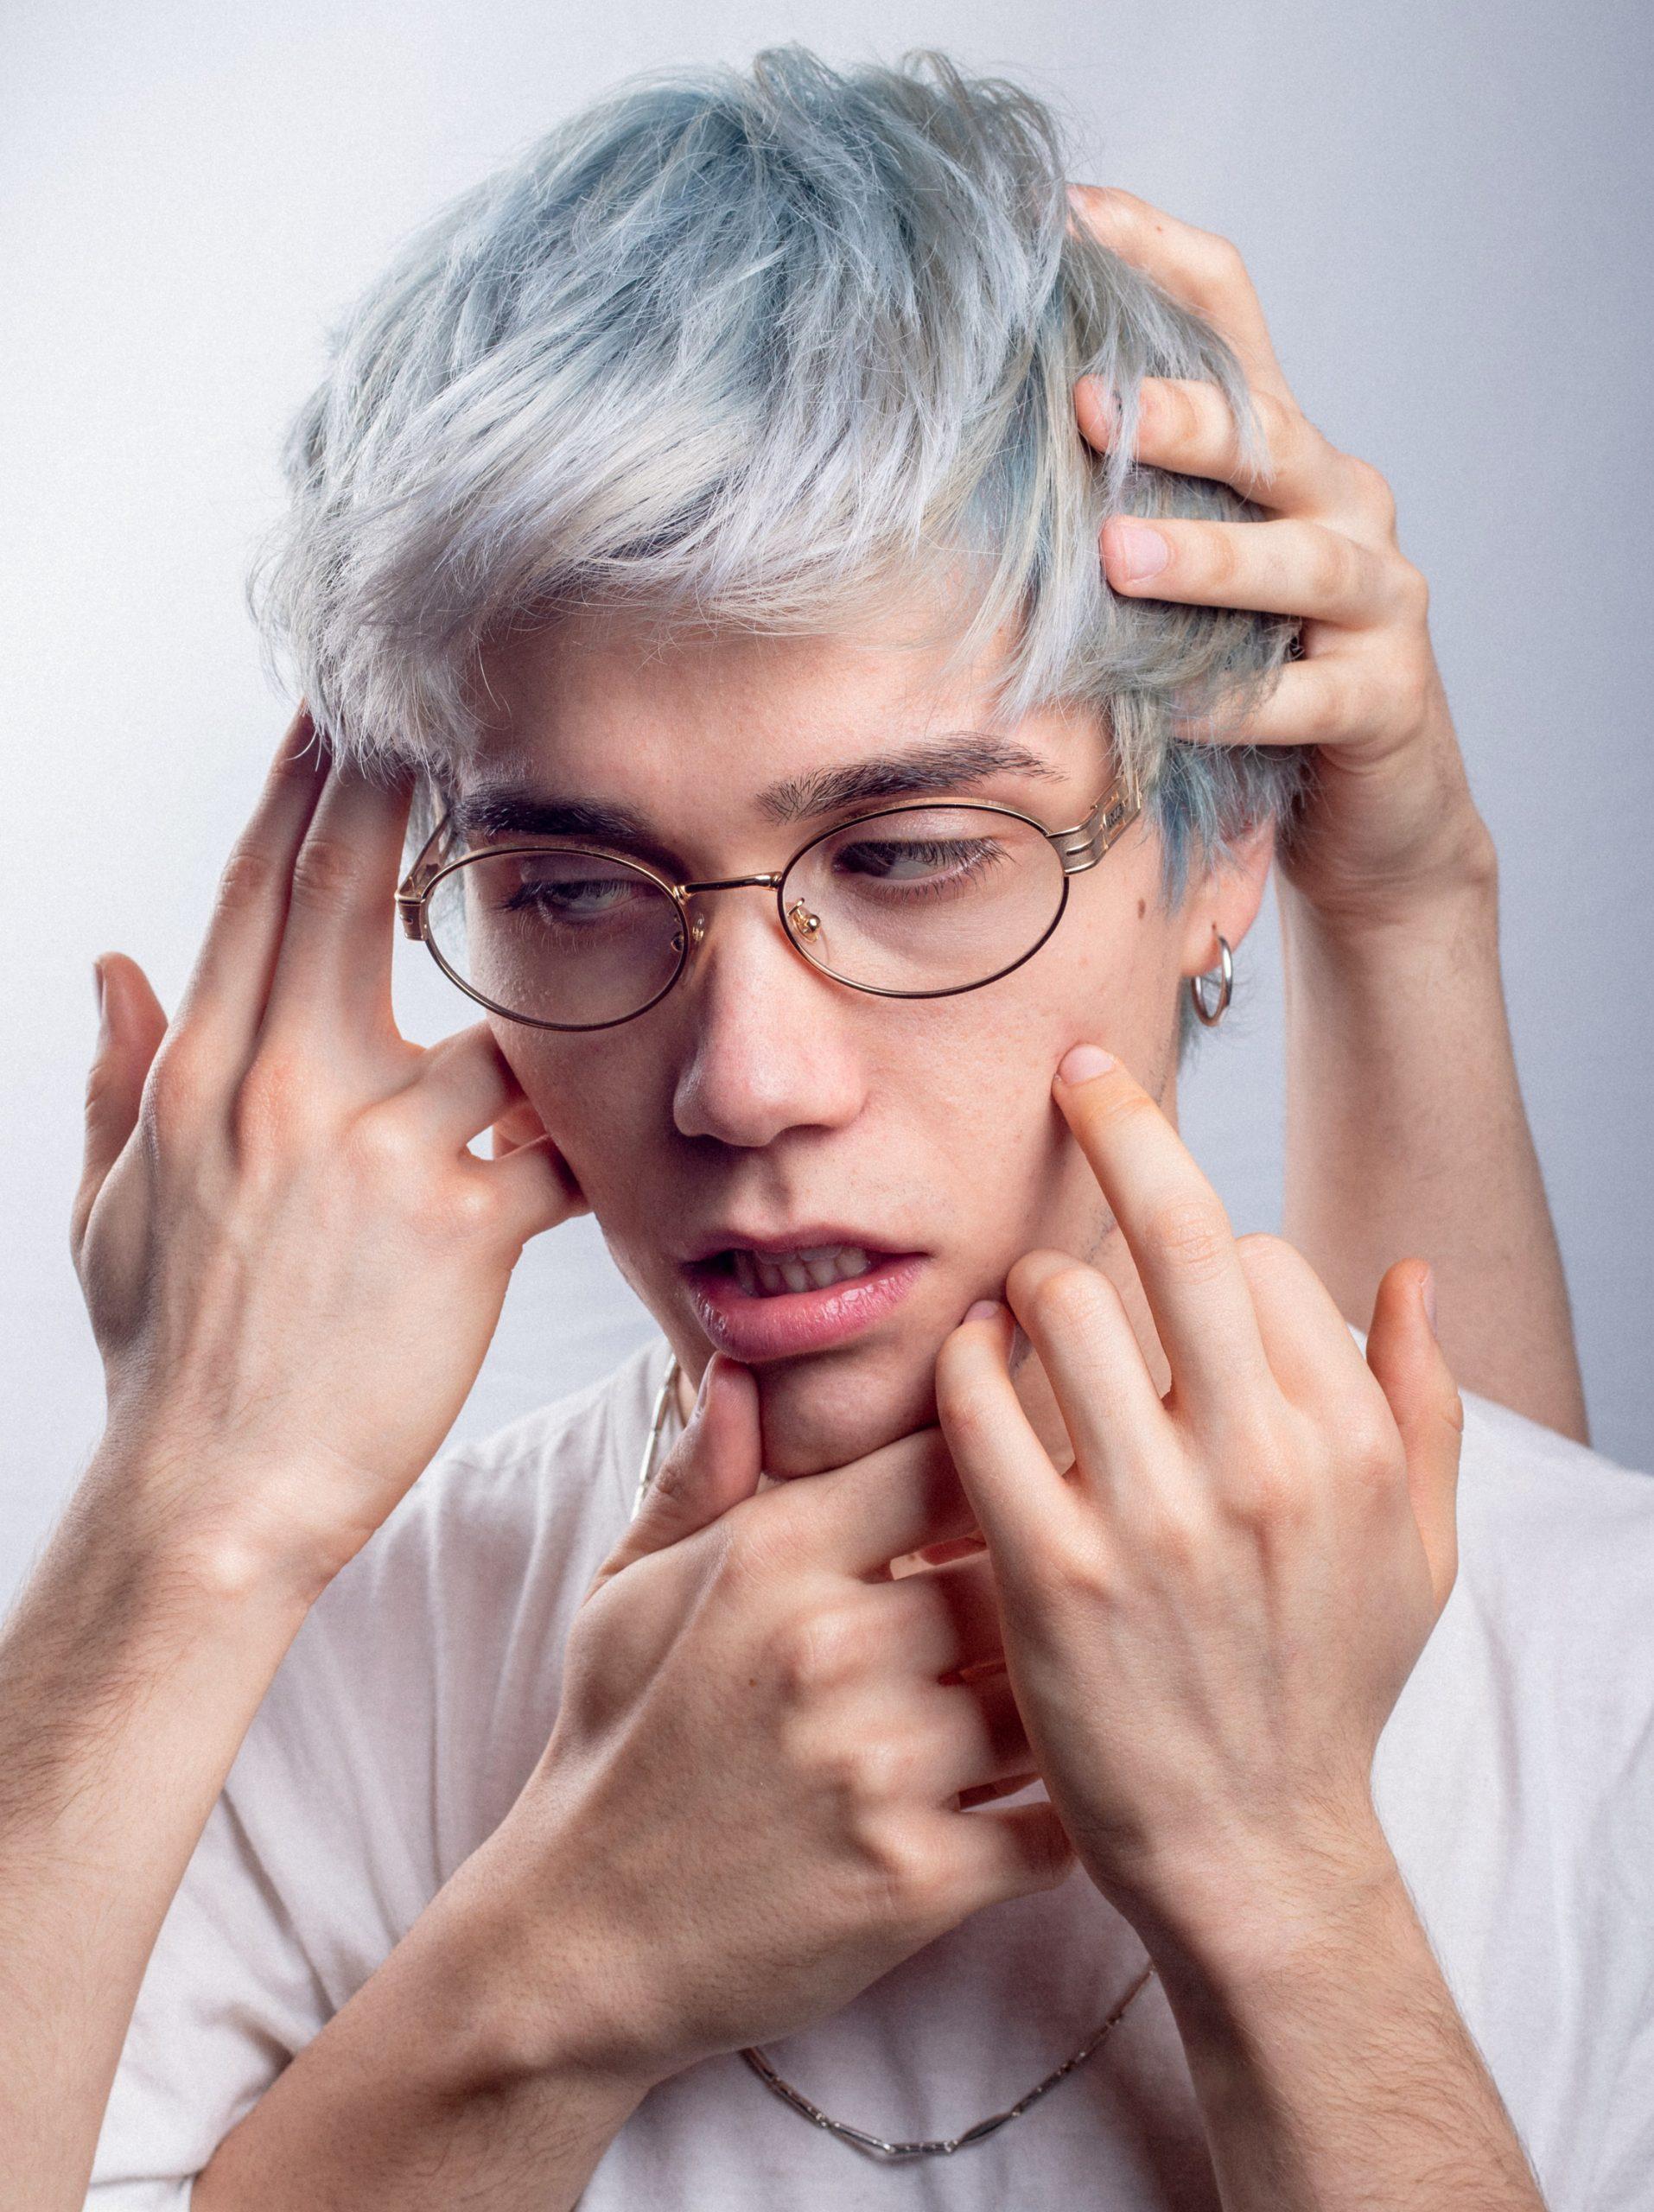 Categorie: Portrait - Photographer: FEDERICO ESPOSITO - Models: MARIO AMENDOLA & SAMUELE GIUDICE - Hair-stylist: GIUDICE PARRUCCHIERI - Location: Lamezia Terme, CZ, Italia